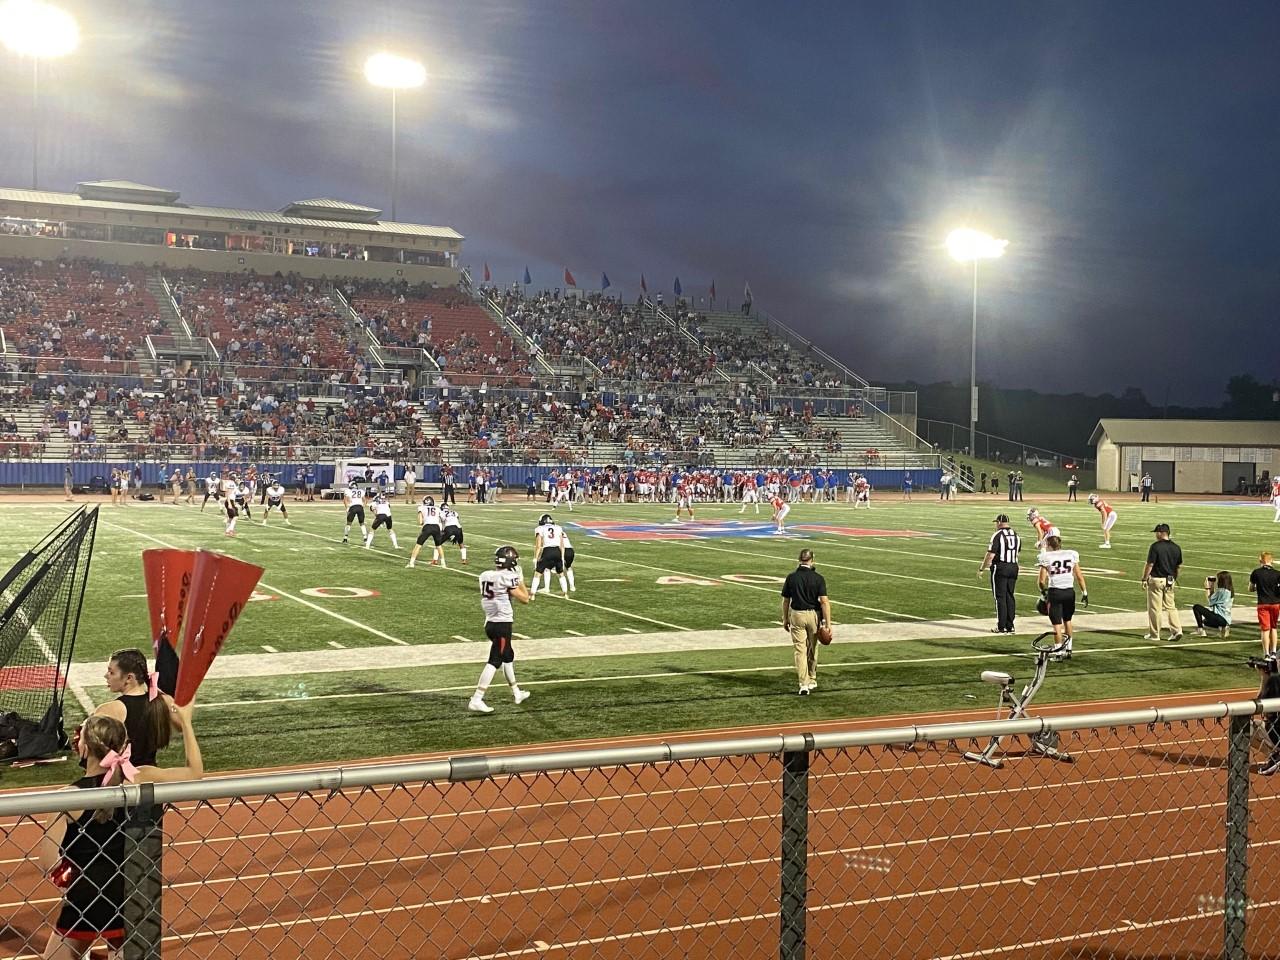 Westlake football vs. Bowie kickoff 2021